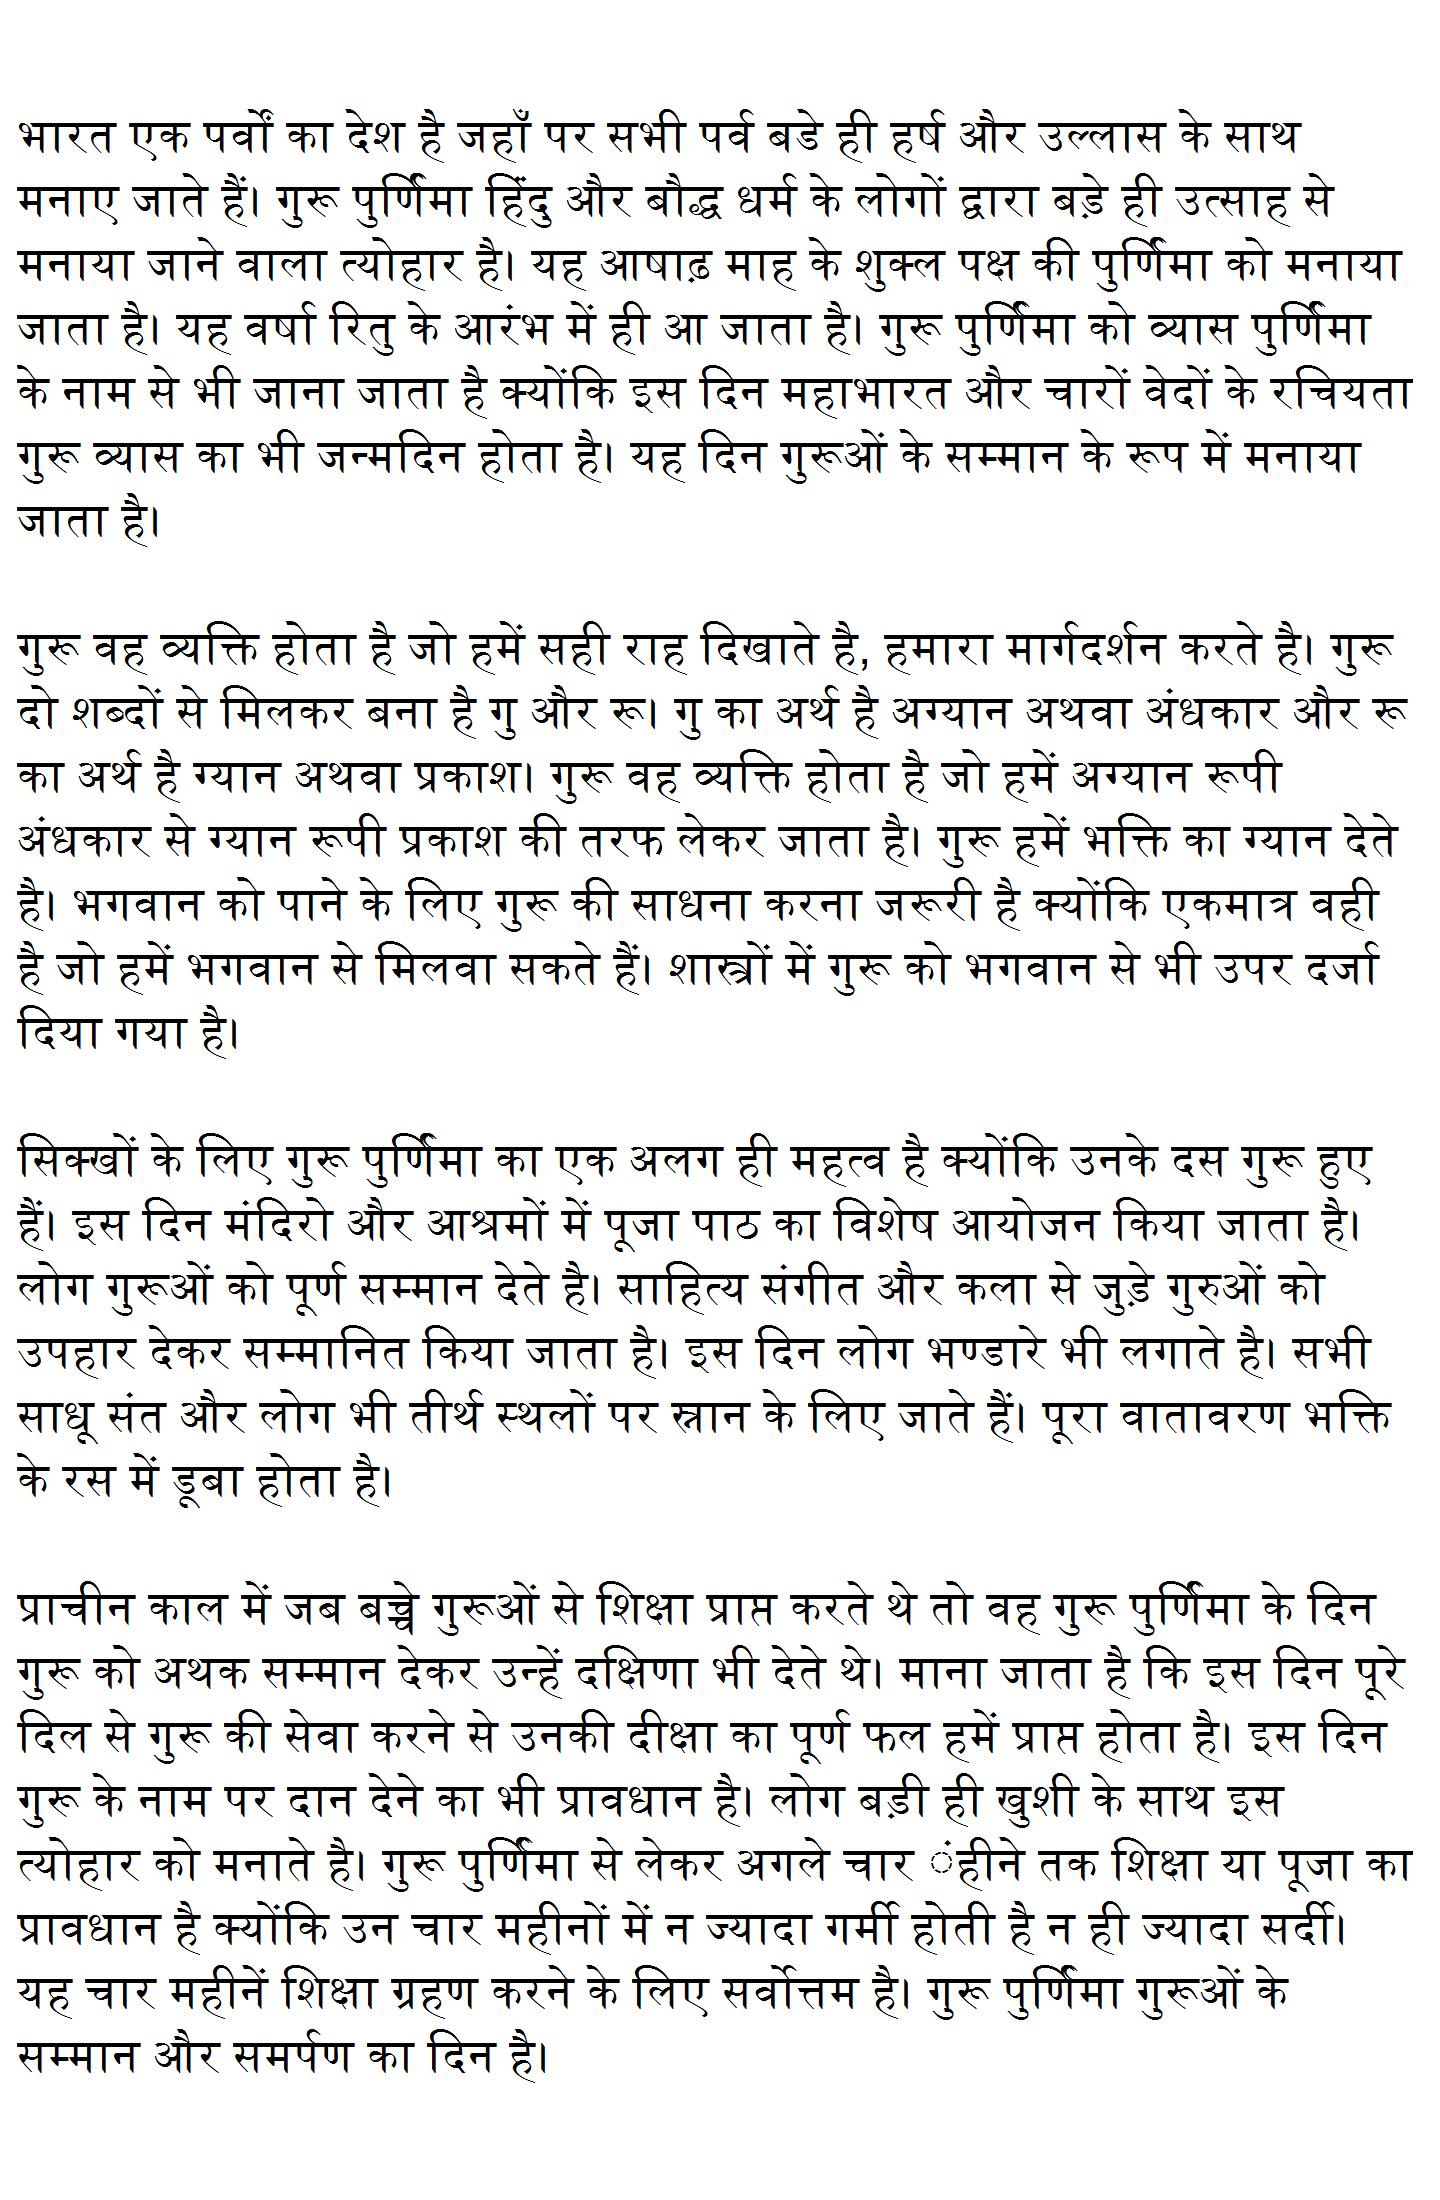 Speech on Guru Purnima 2019 : English, Hindi Marathi - India